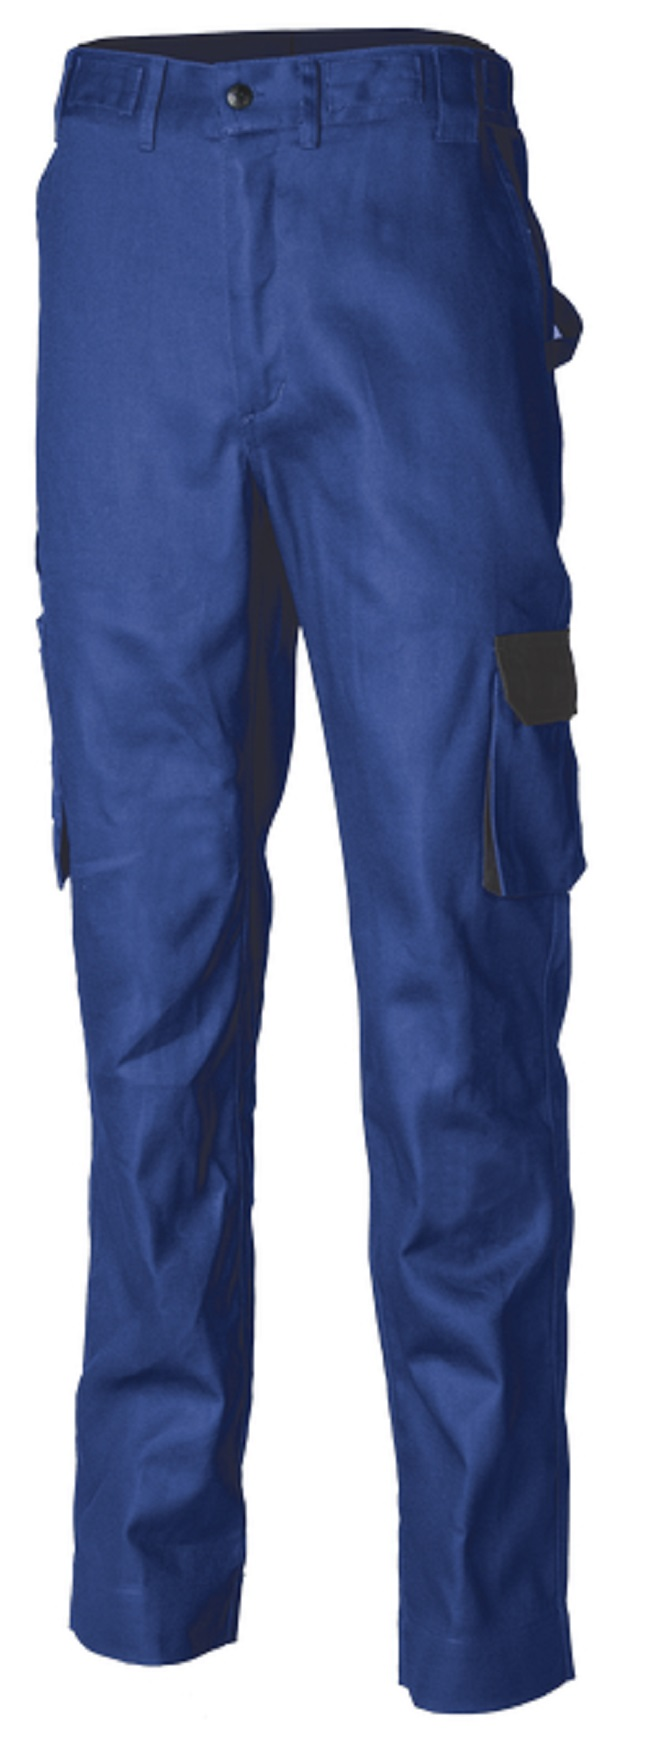 pantaloni-technicity-royal